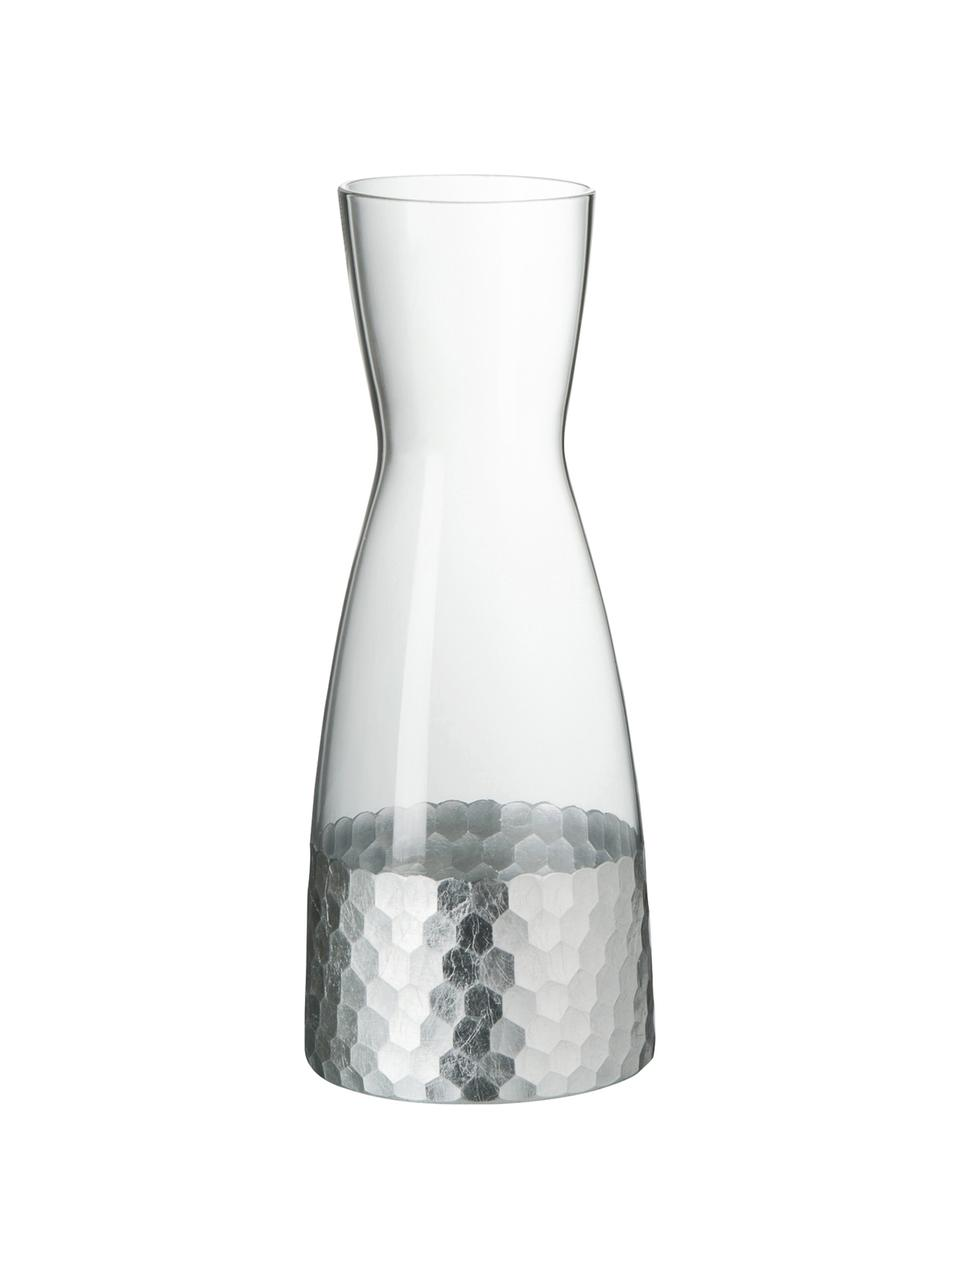 Carafe en verreWasp, 1,15l, Transparent, gris argent